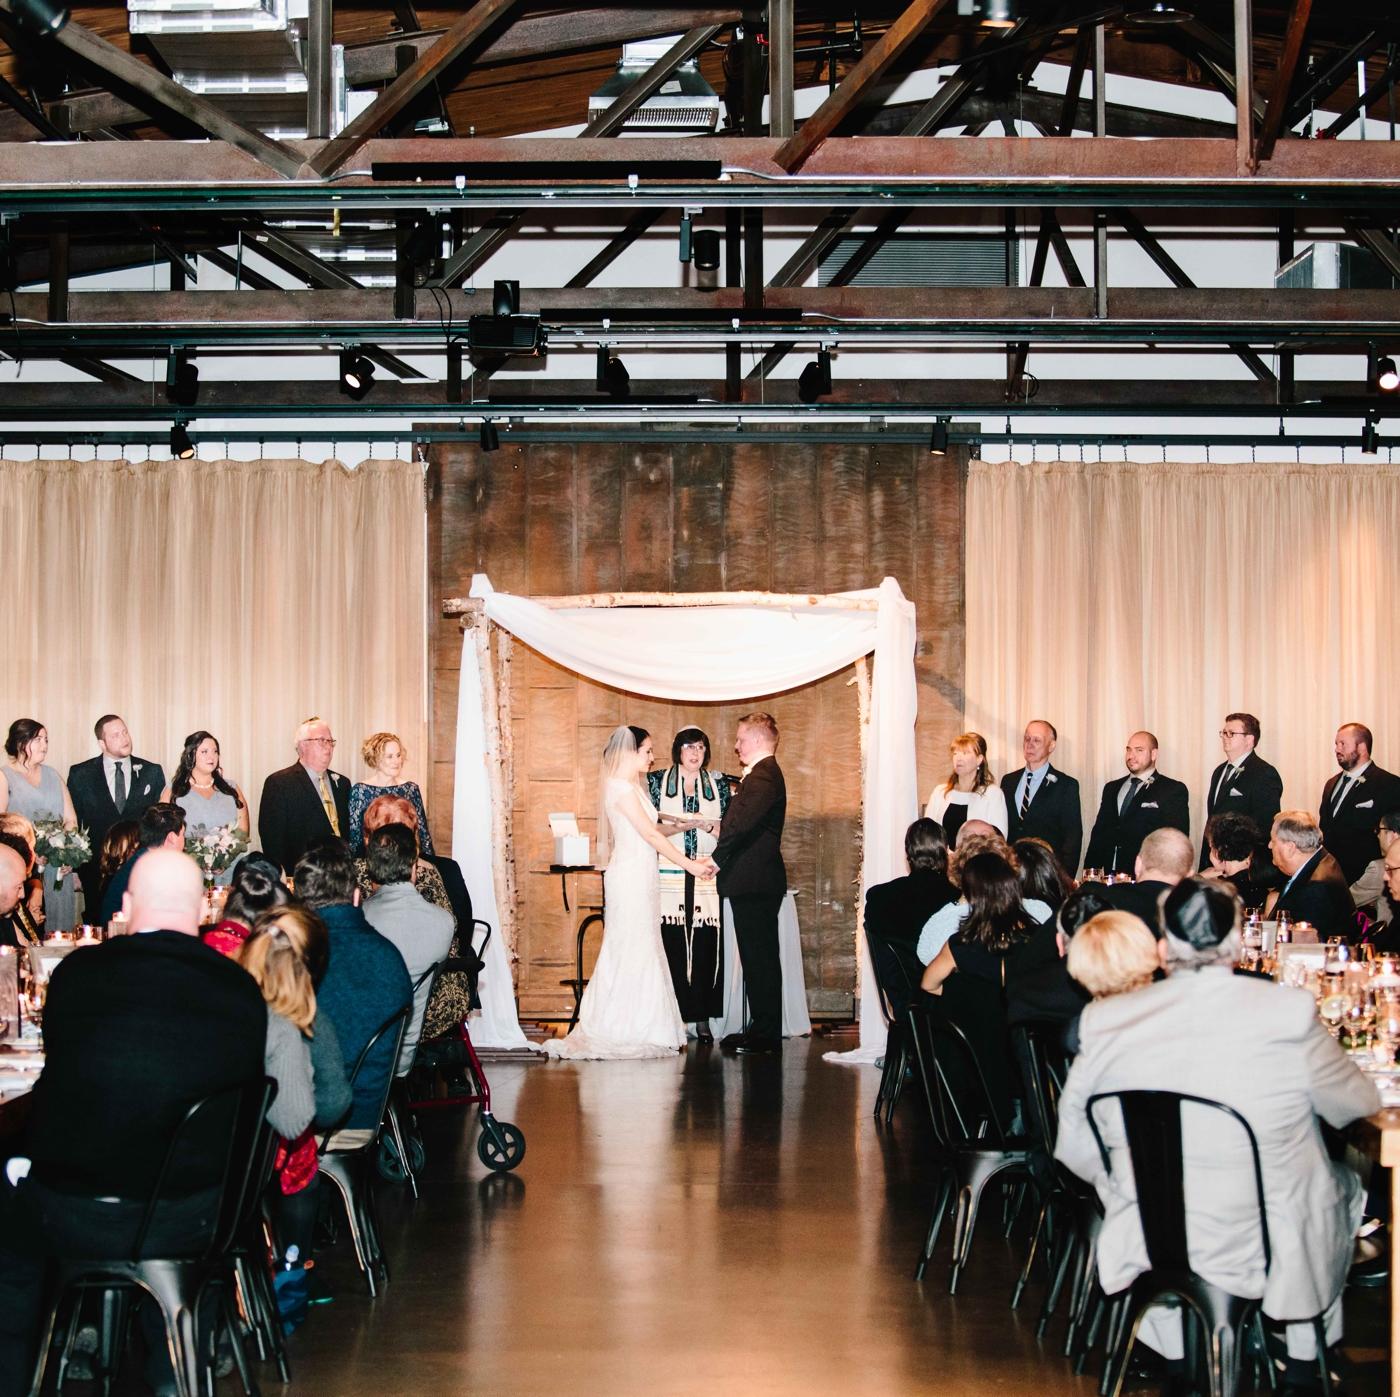 chicago-fine-art-wedding-photography-lintelman34